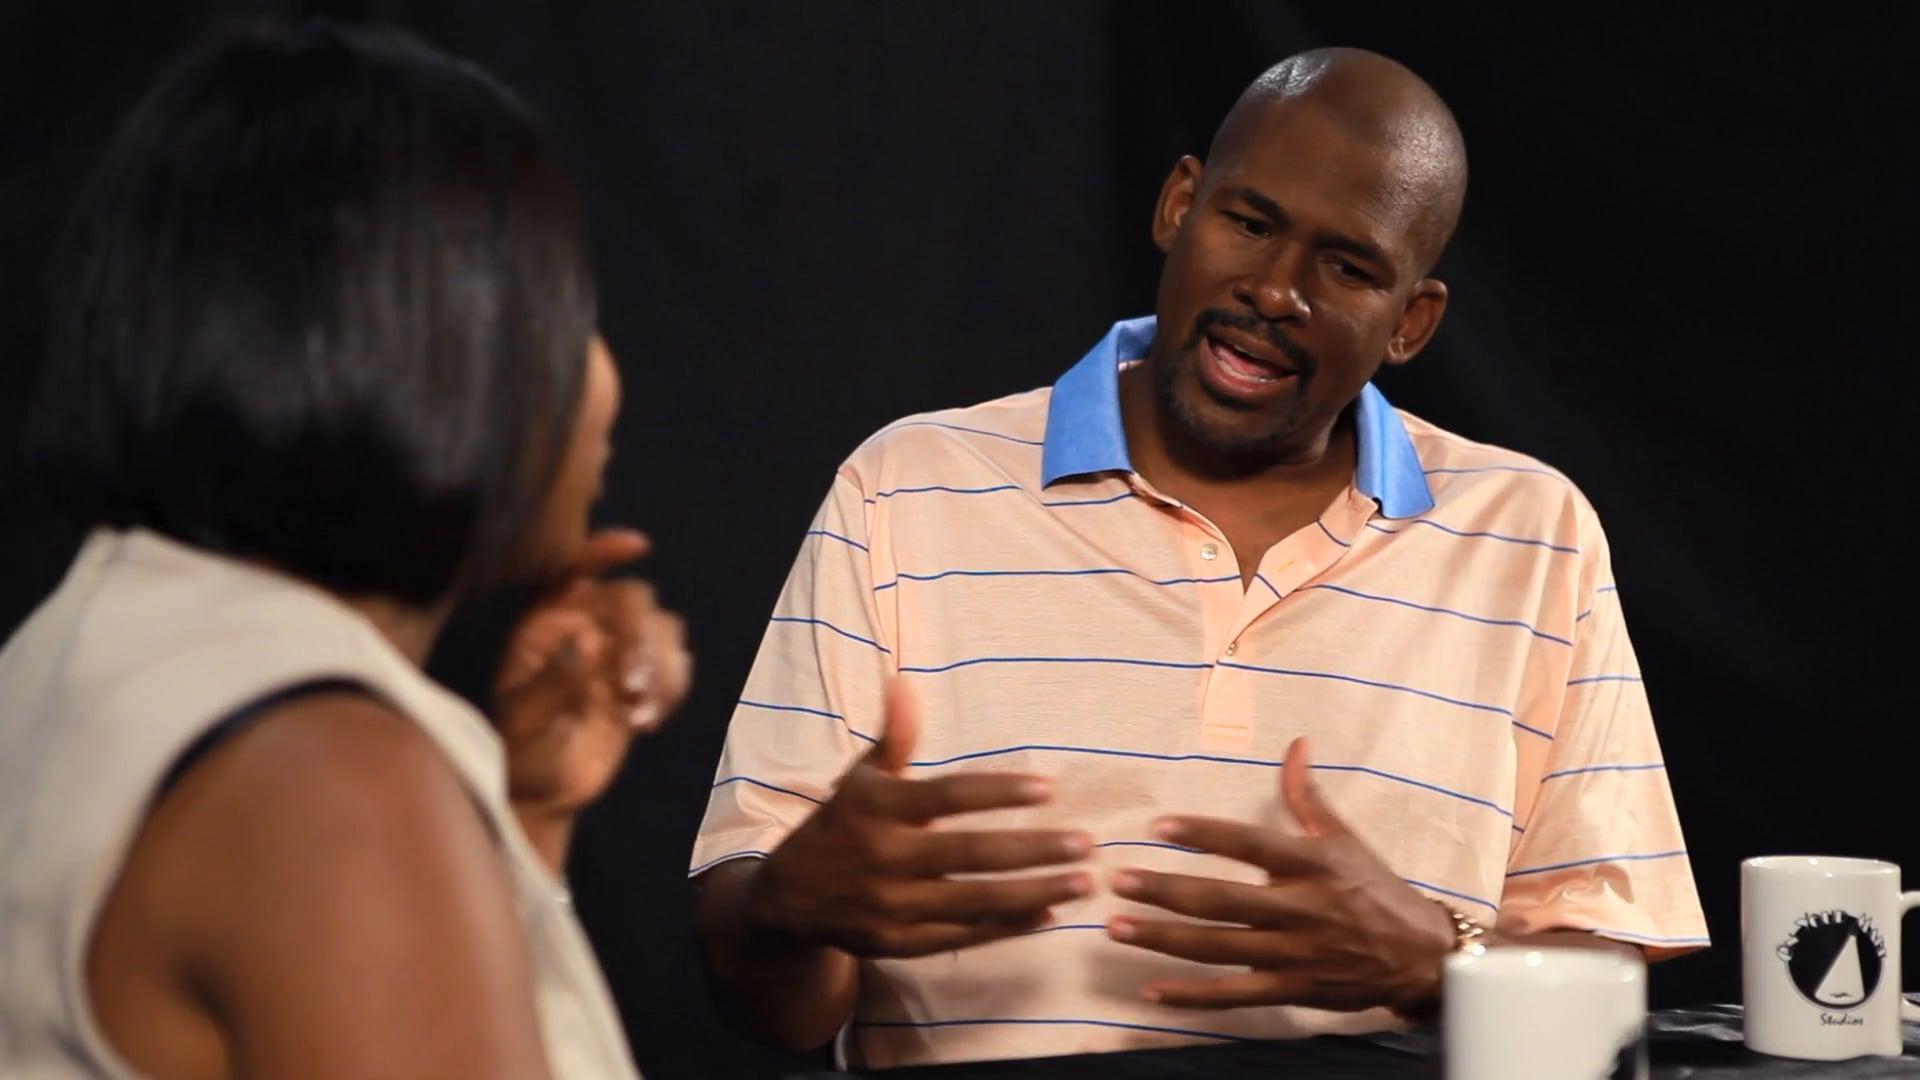 The Interview Show with Kristen Jackson - Guest MC Burton   Ep. 1.4